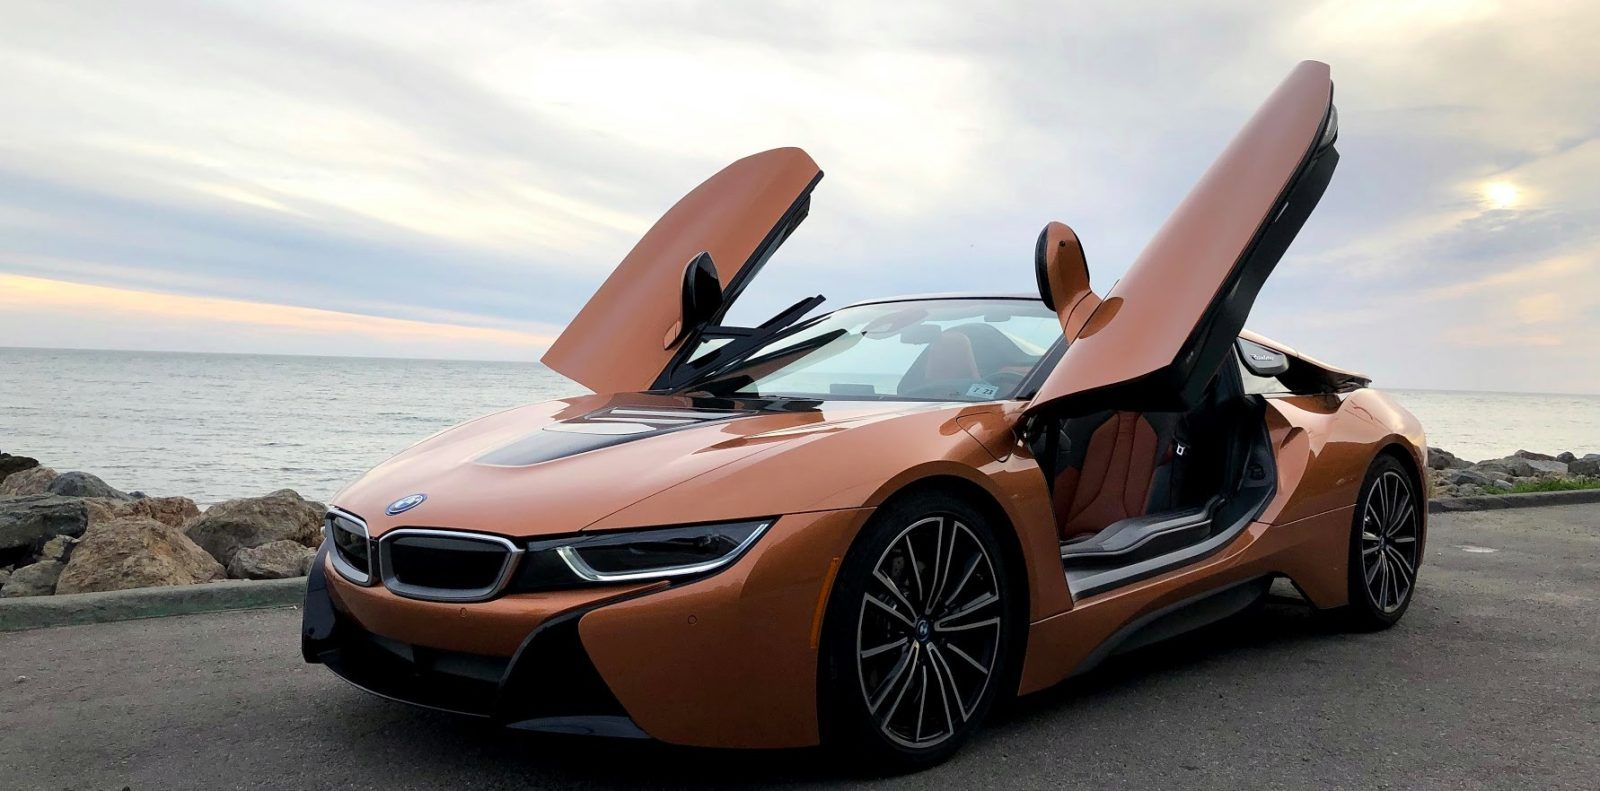 Idealmagnetsolutions On Bmw I8 Bmw Sports Sedan